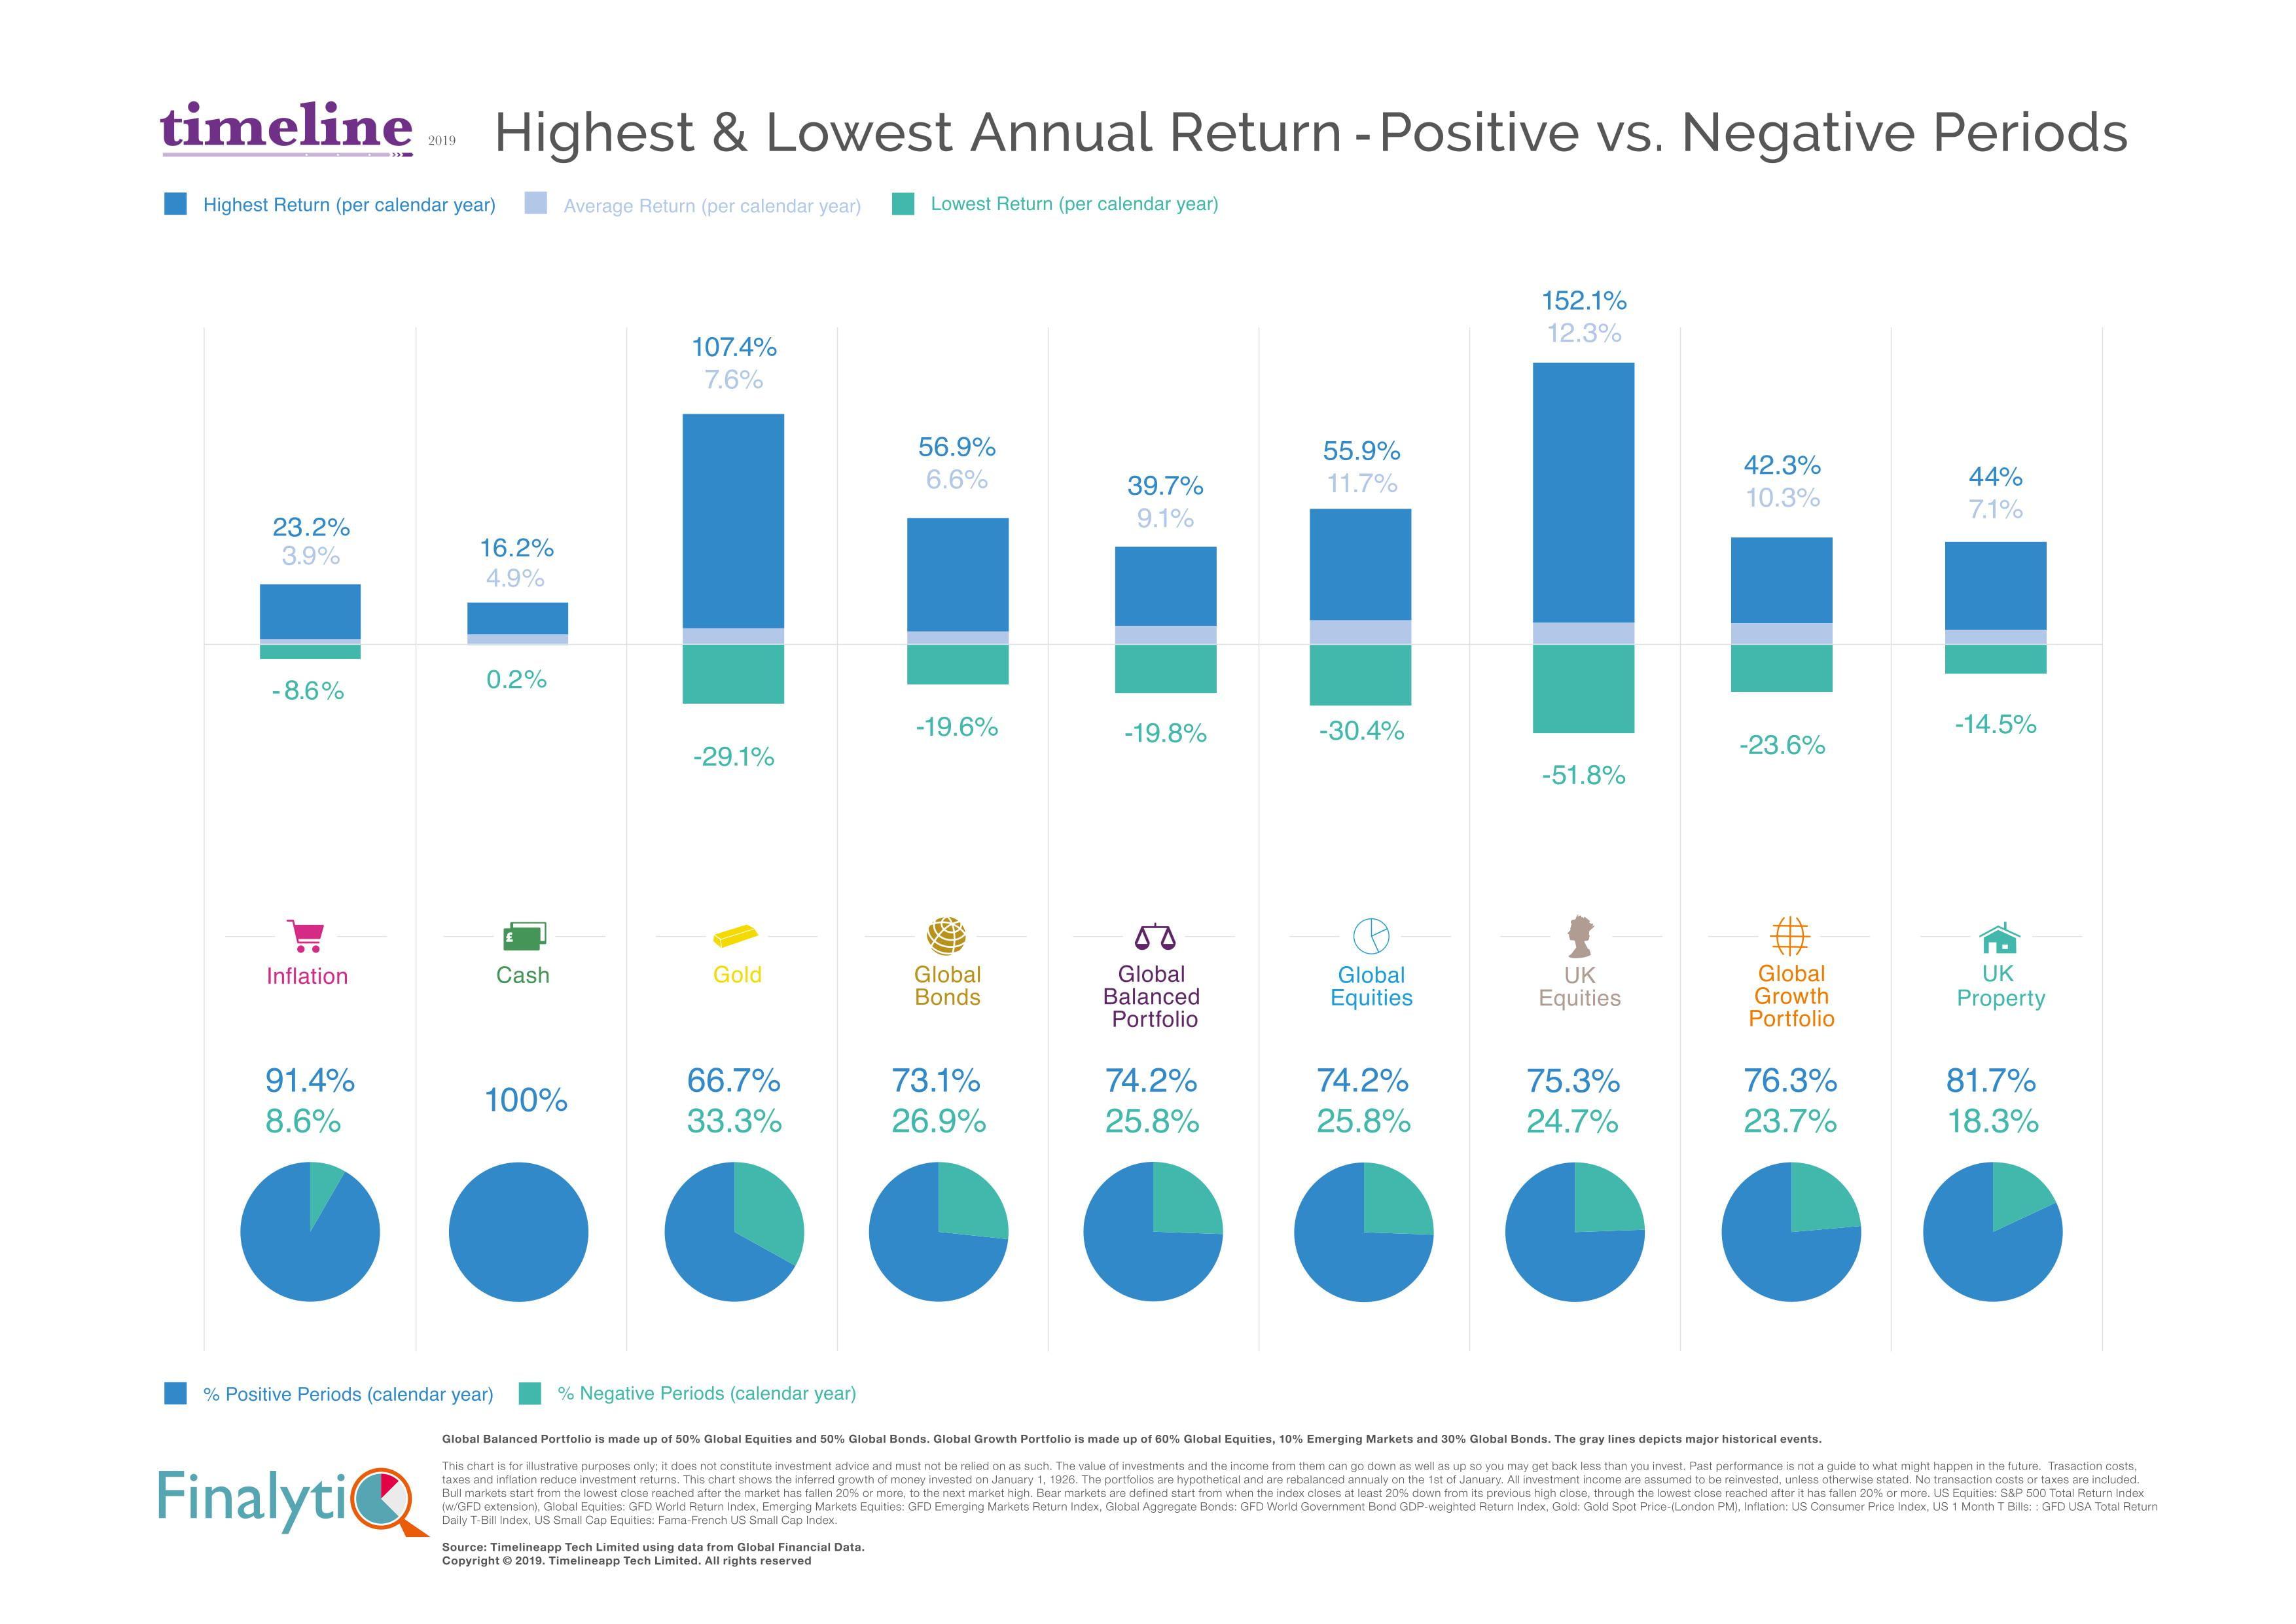 Highest & Lowest Annual Return - Positive vs. negative periods